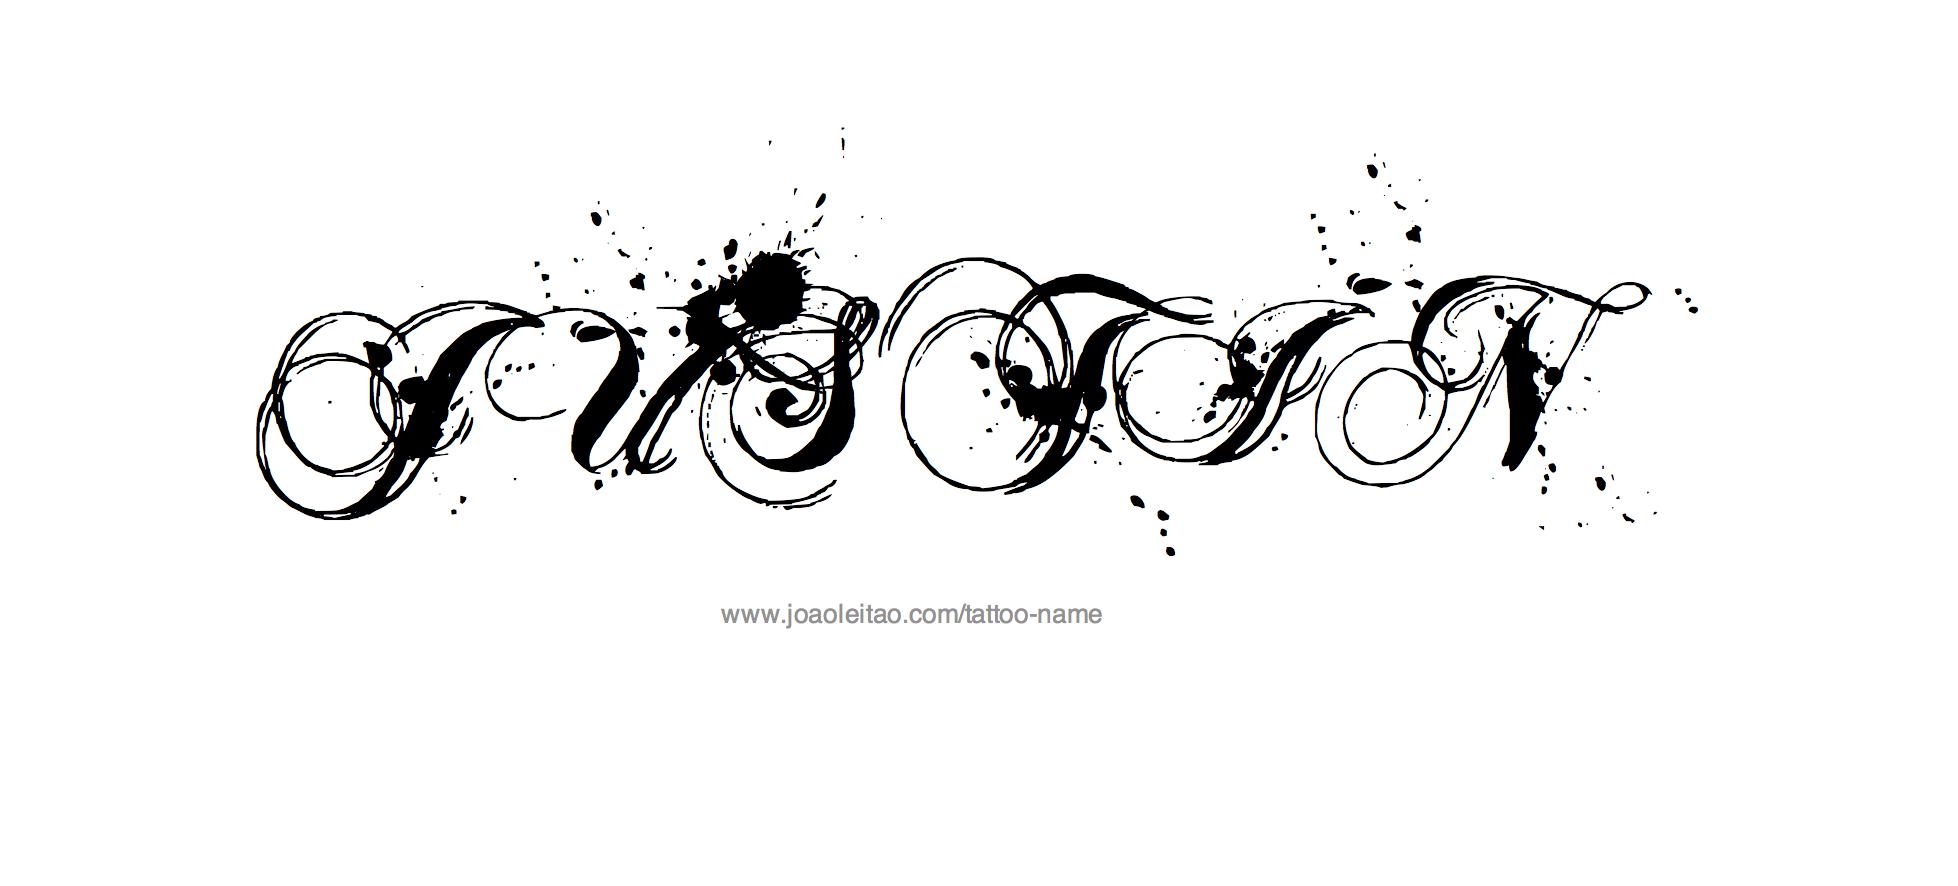 Justin Name Tattoo Designs Name Tattoo Designs Name Tattoo Name Tattoos